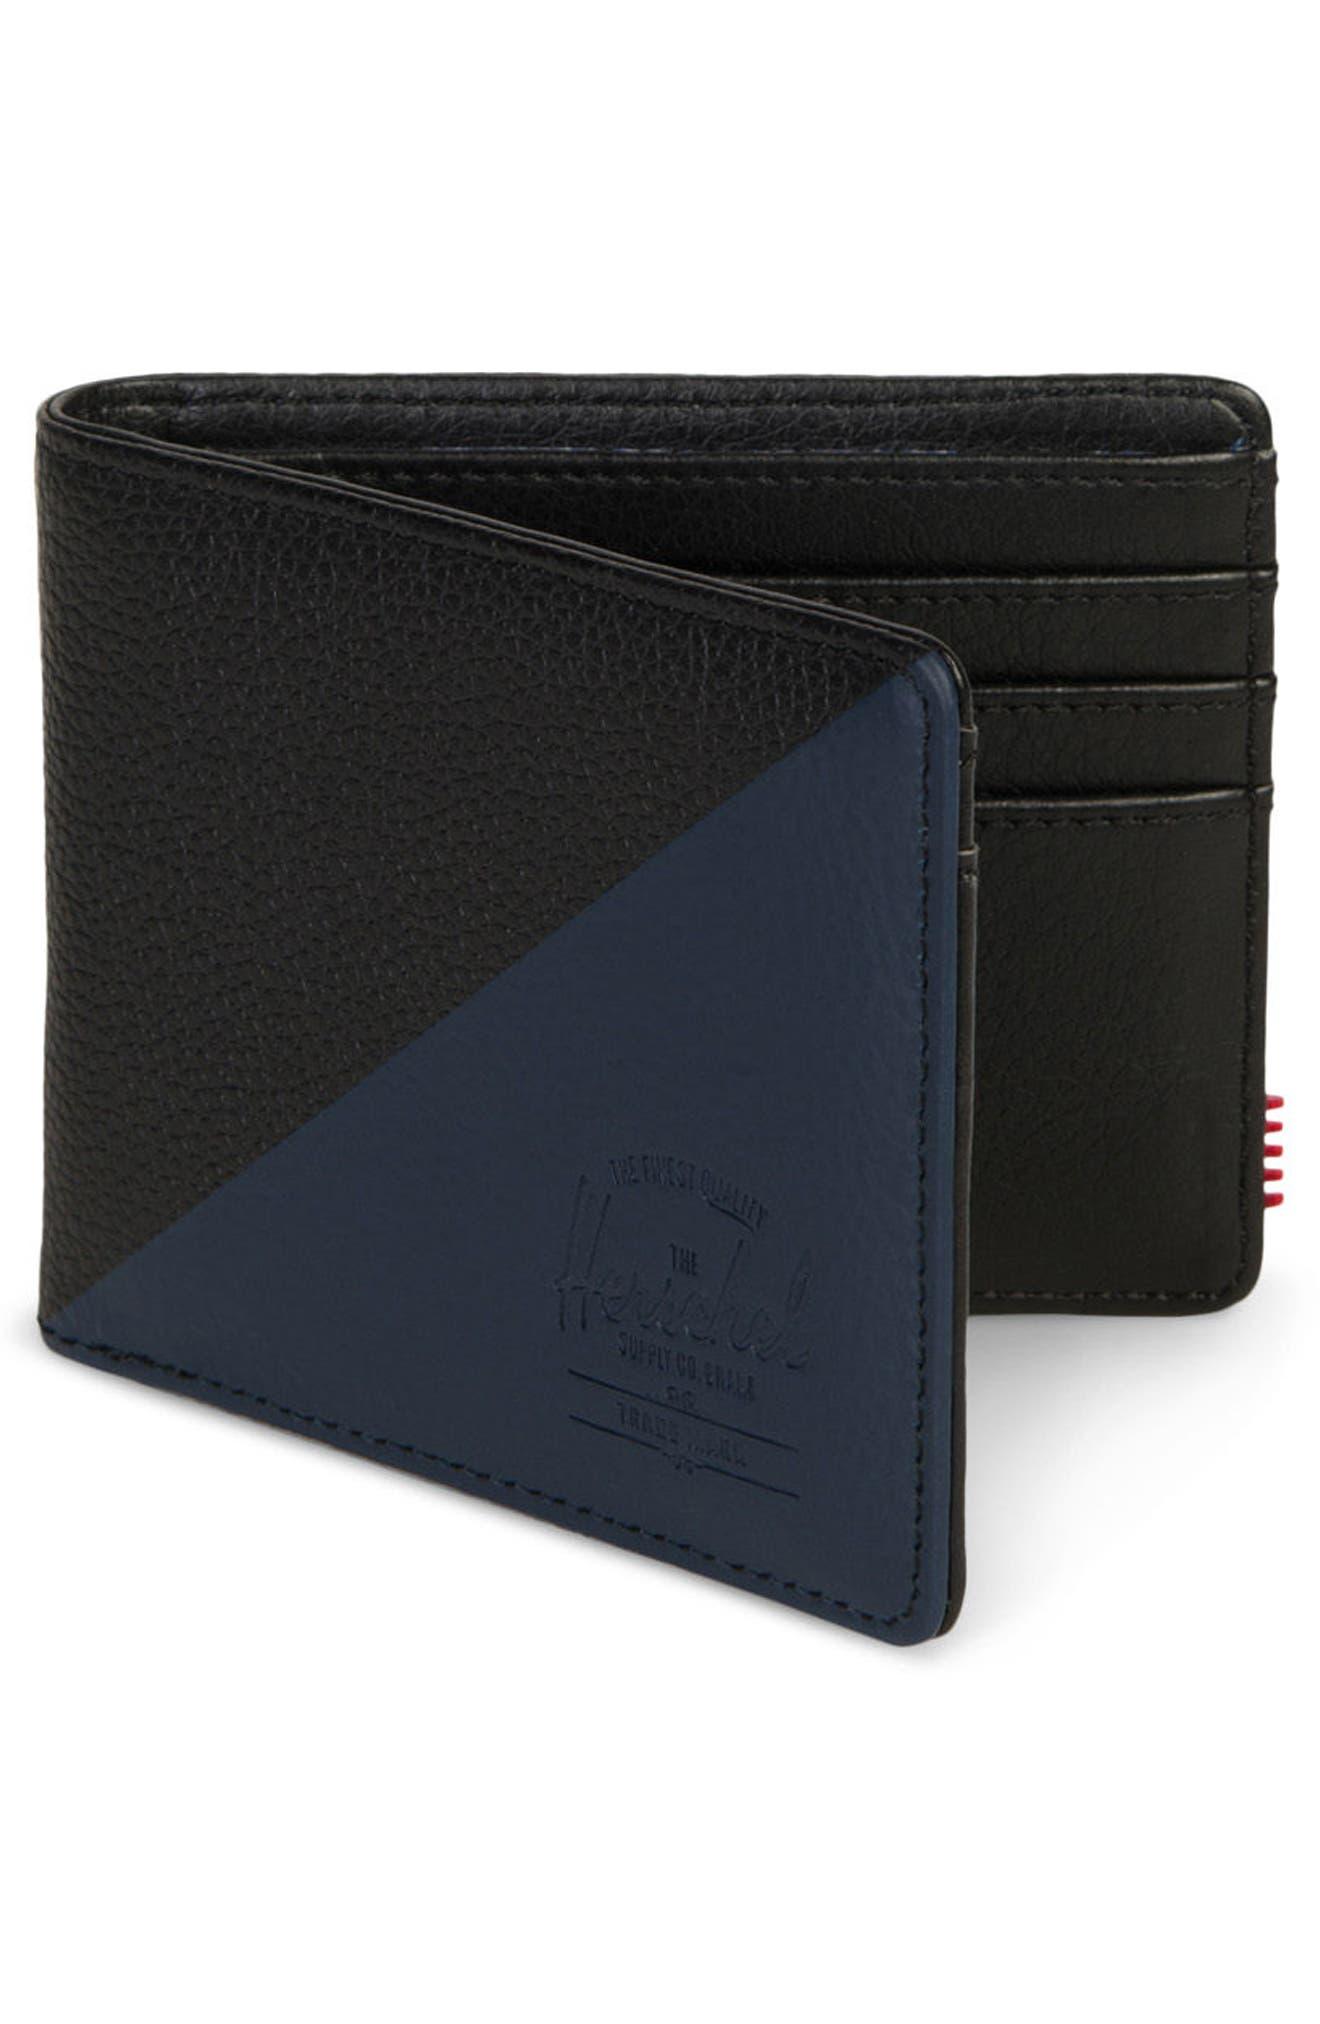 Hank Leather Wallet,                             Alternate thumbnail 3, color,                             Black